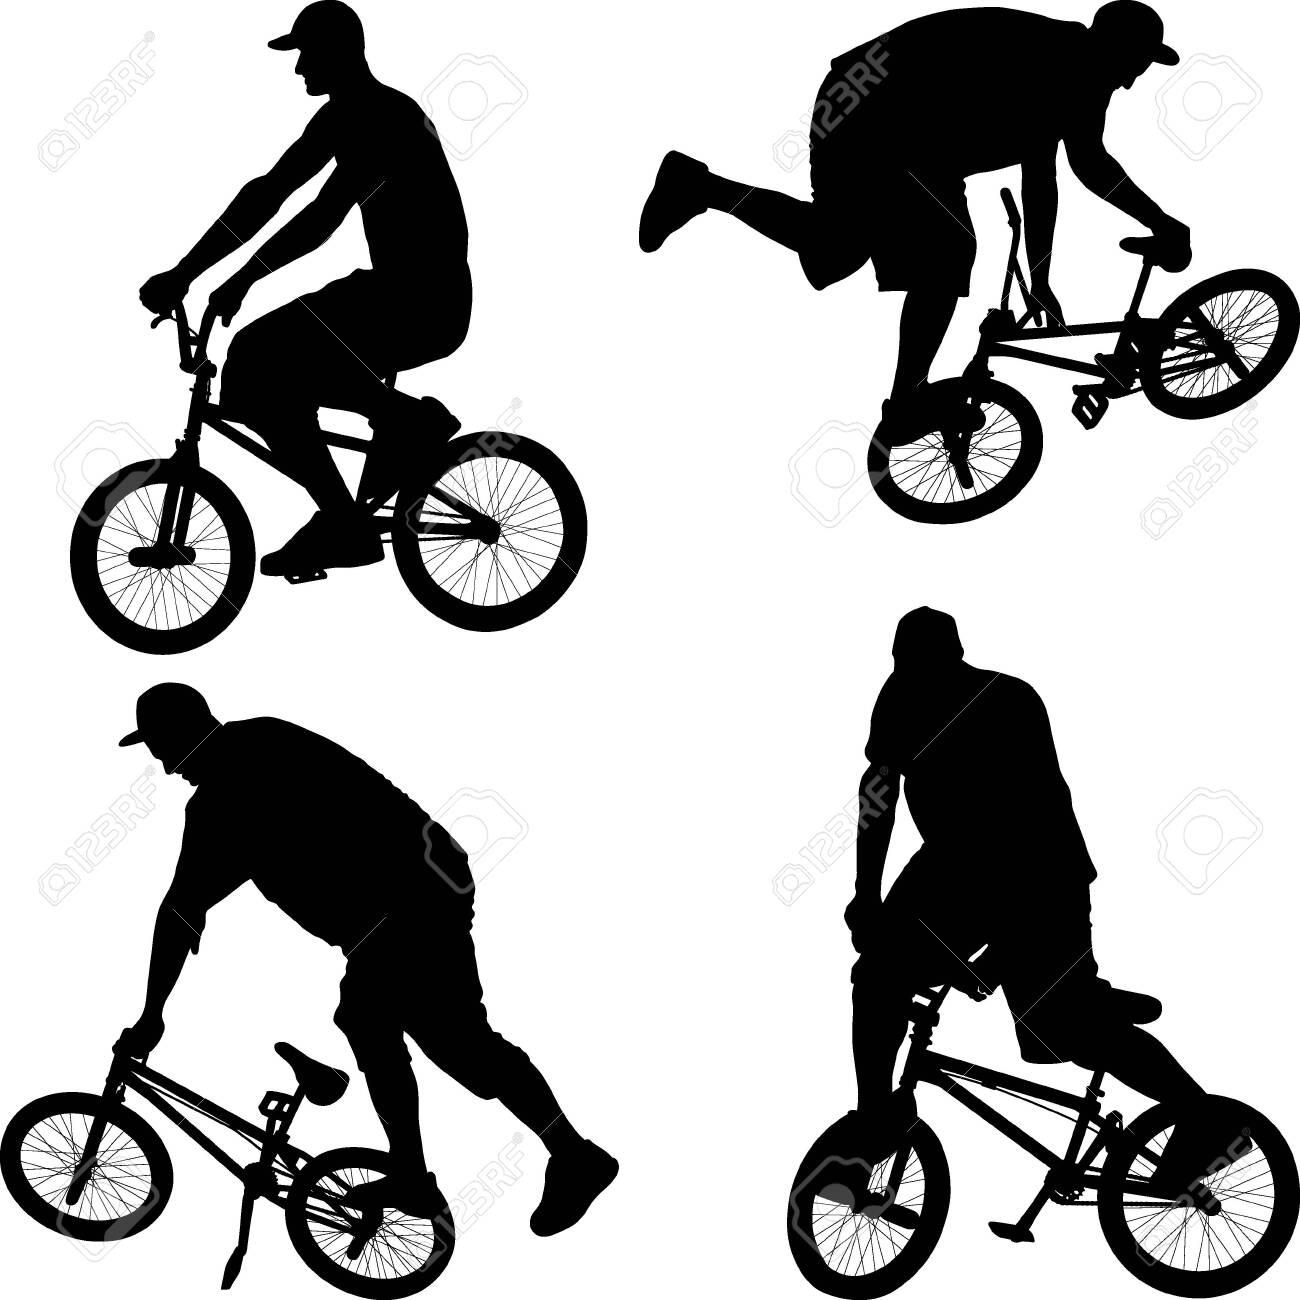 male doing bike trick on BMX bicycle - 138717083